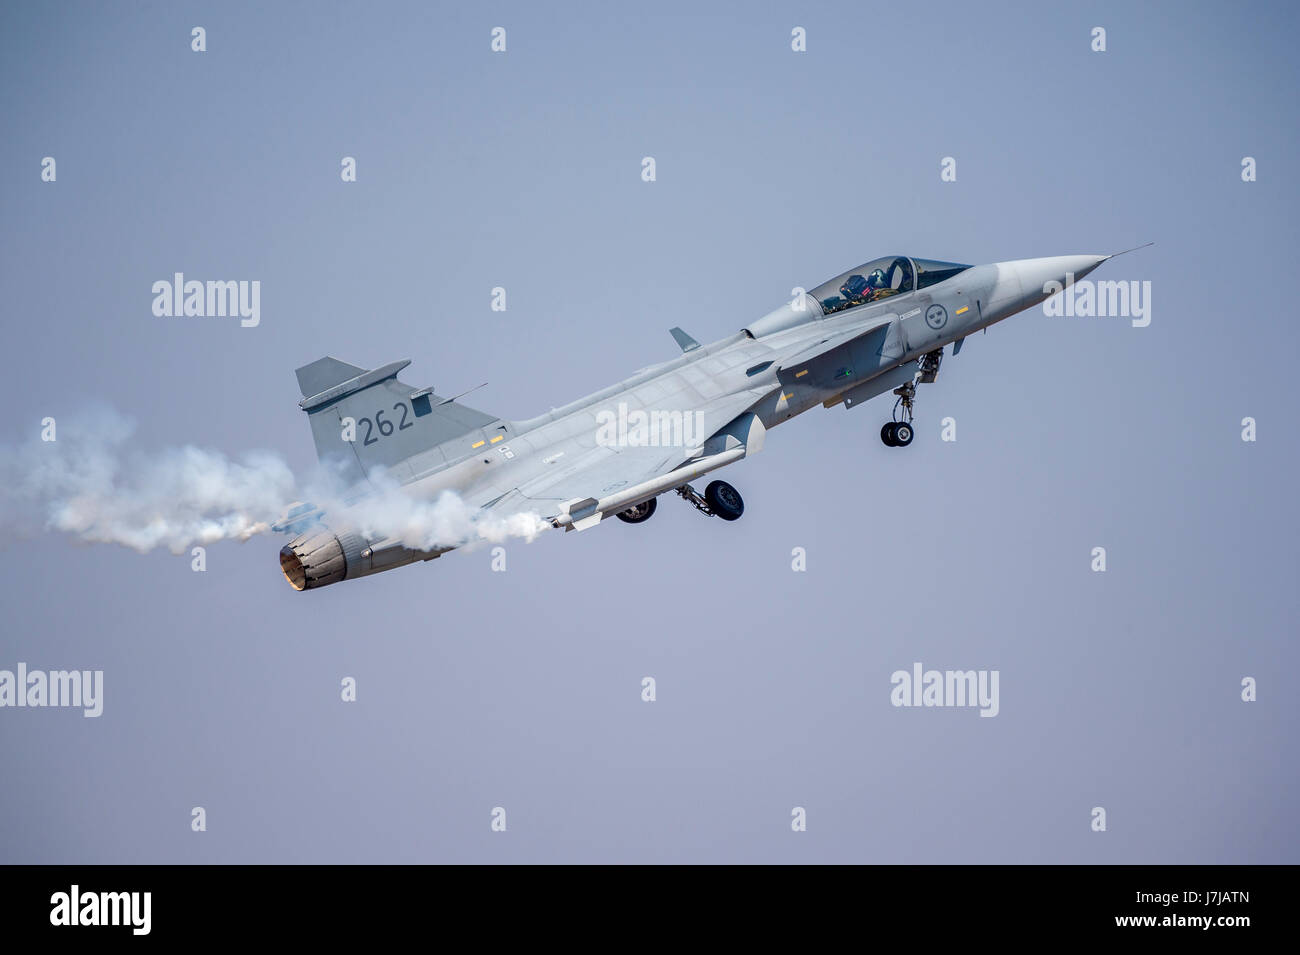 Saab JAS 39 Gripen multirole fighter aircraft - Stock Image